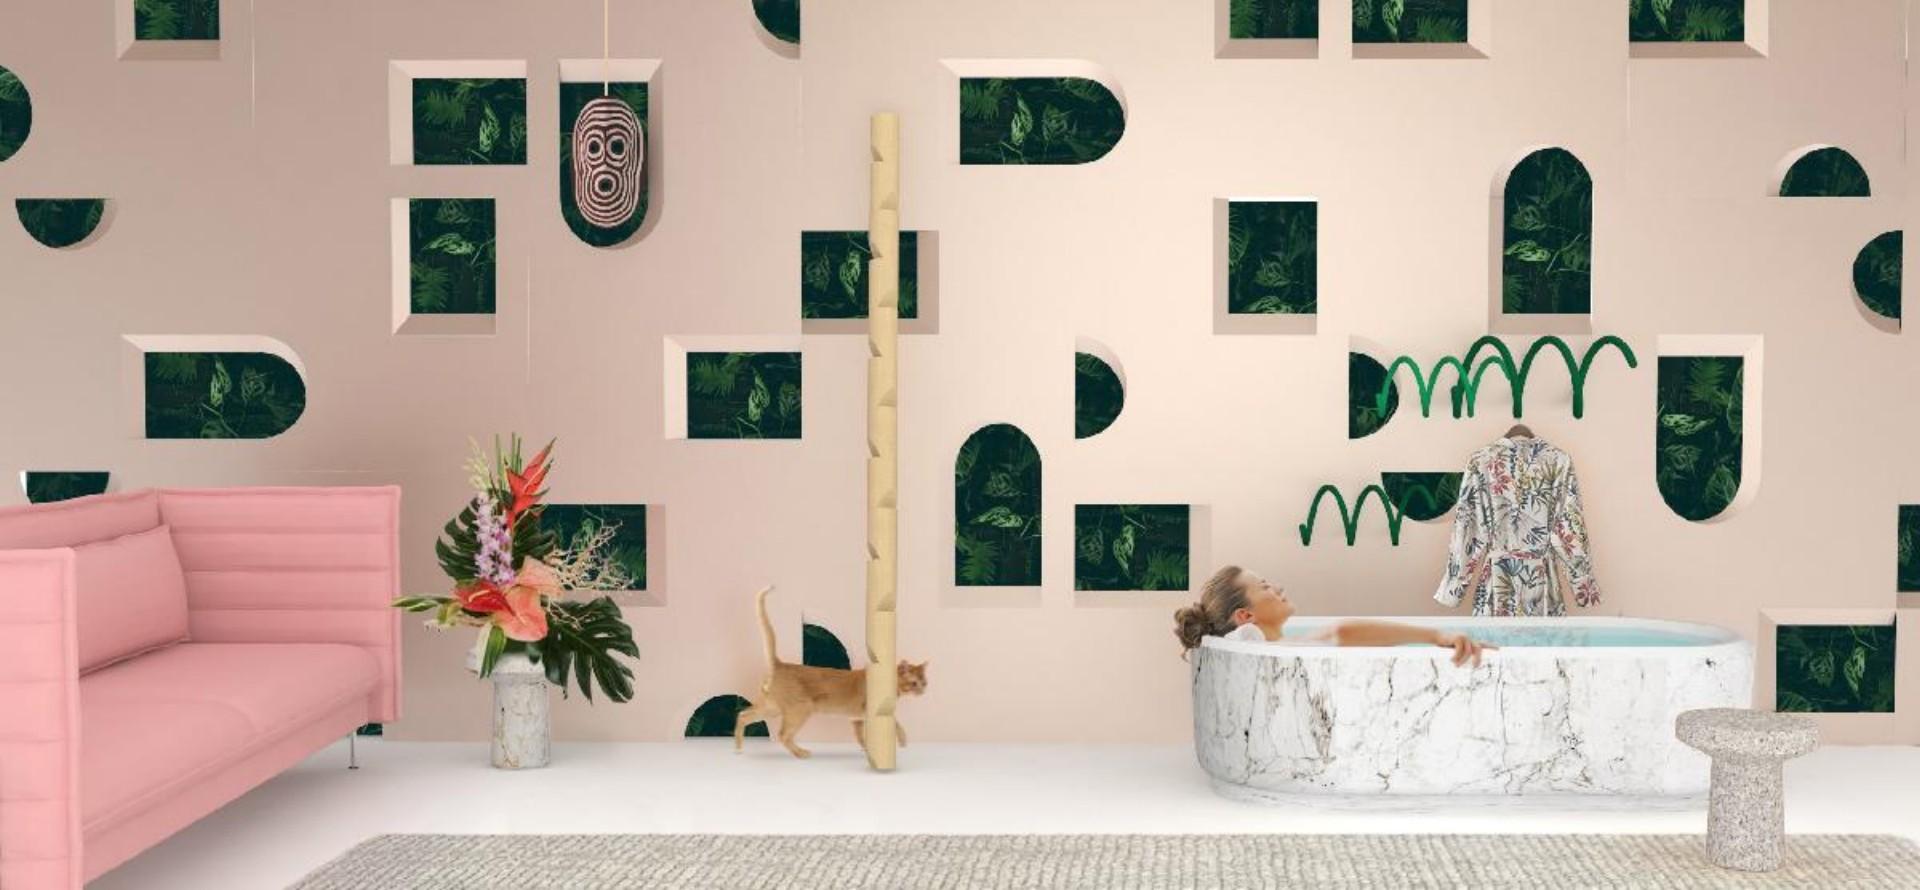 NextLandmark International Contest 2018: Venice, Hospitality Interior Design